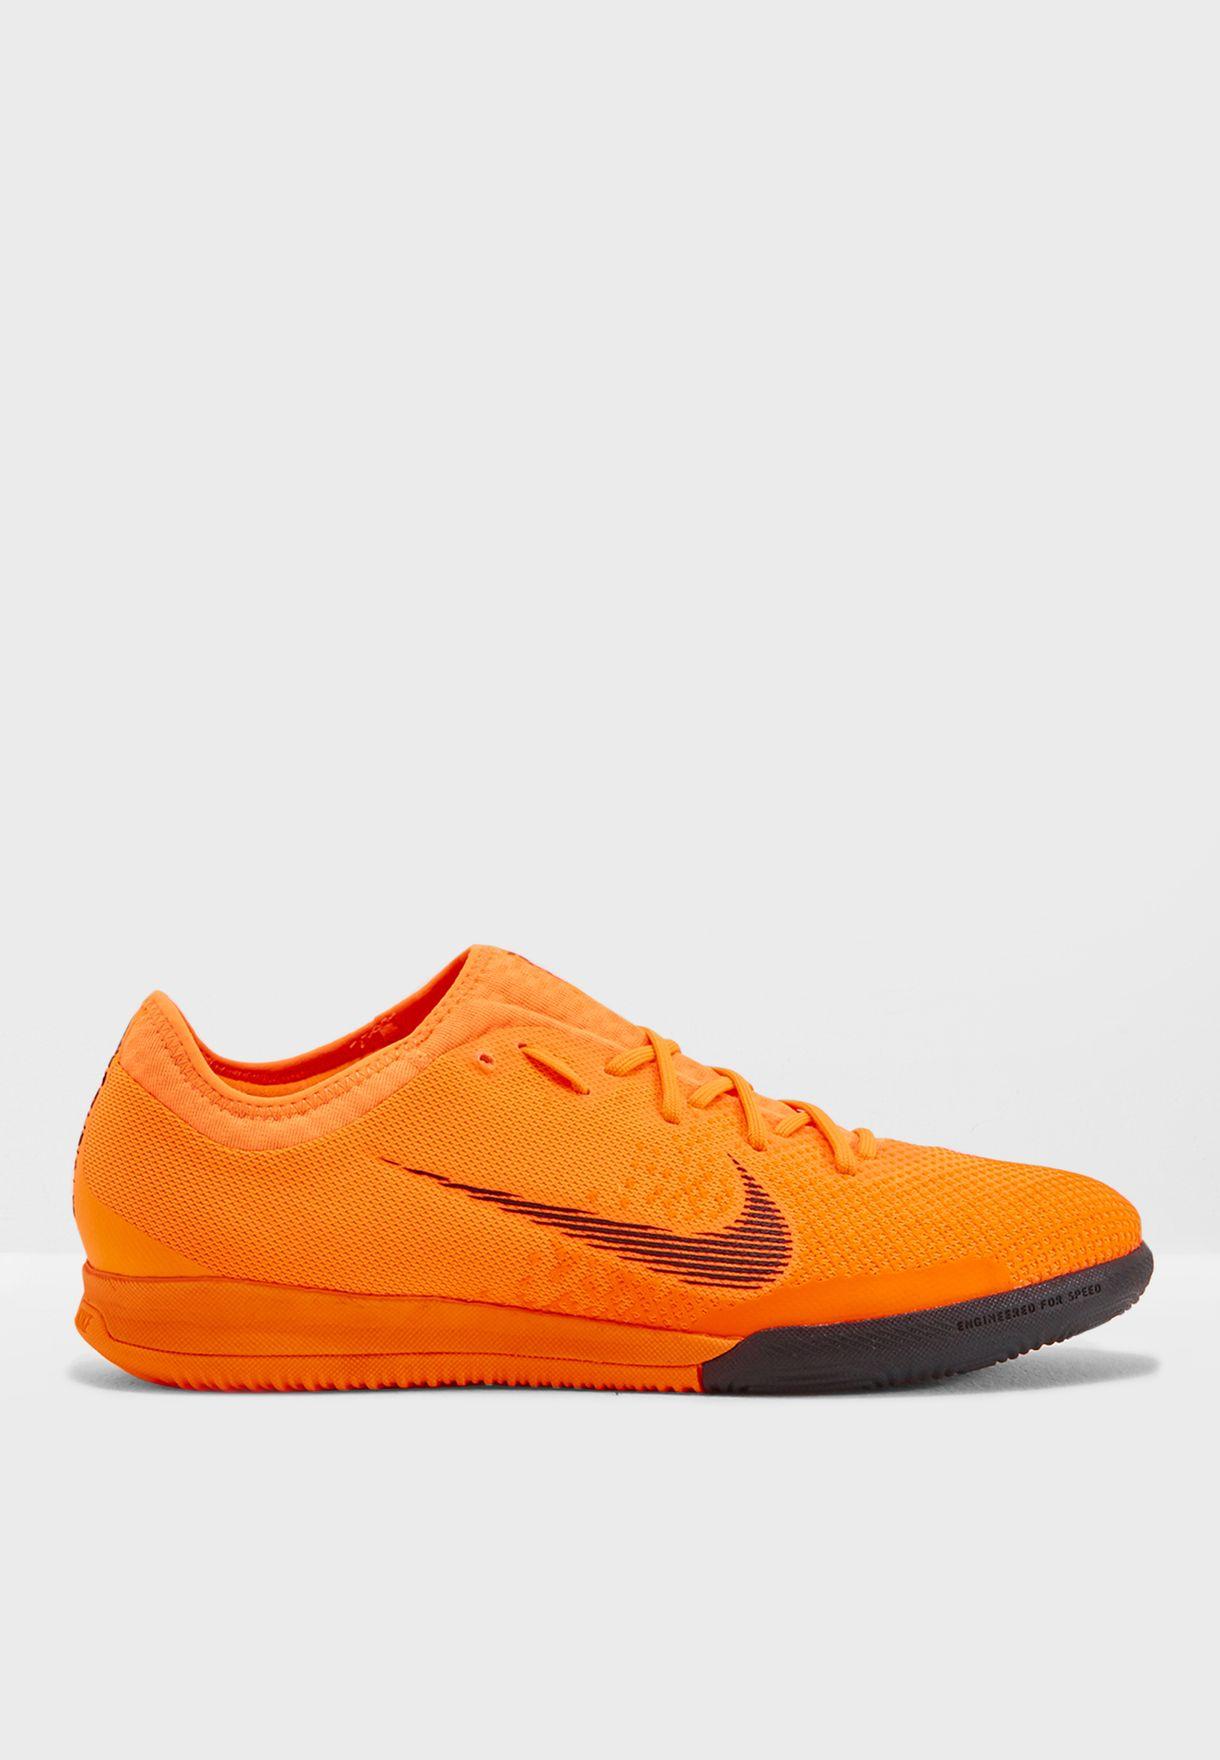 60a3a7353 Shop Nike orange Mercurial Vaporx 12 Pro IC AH7387-810 for Men in ...